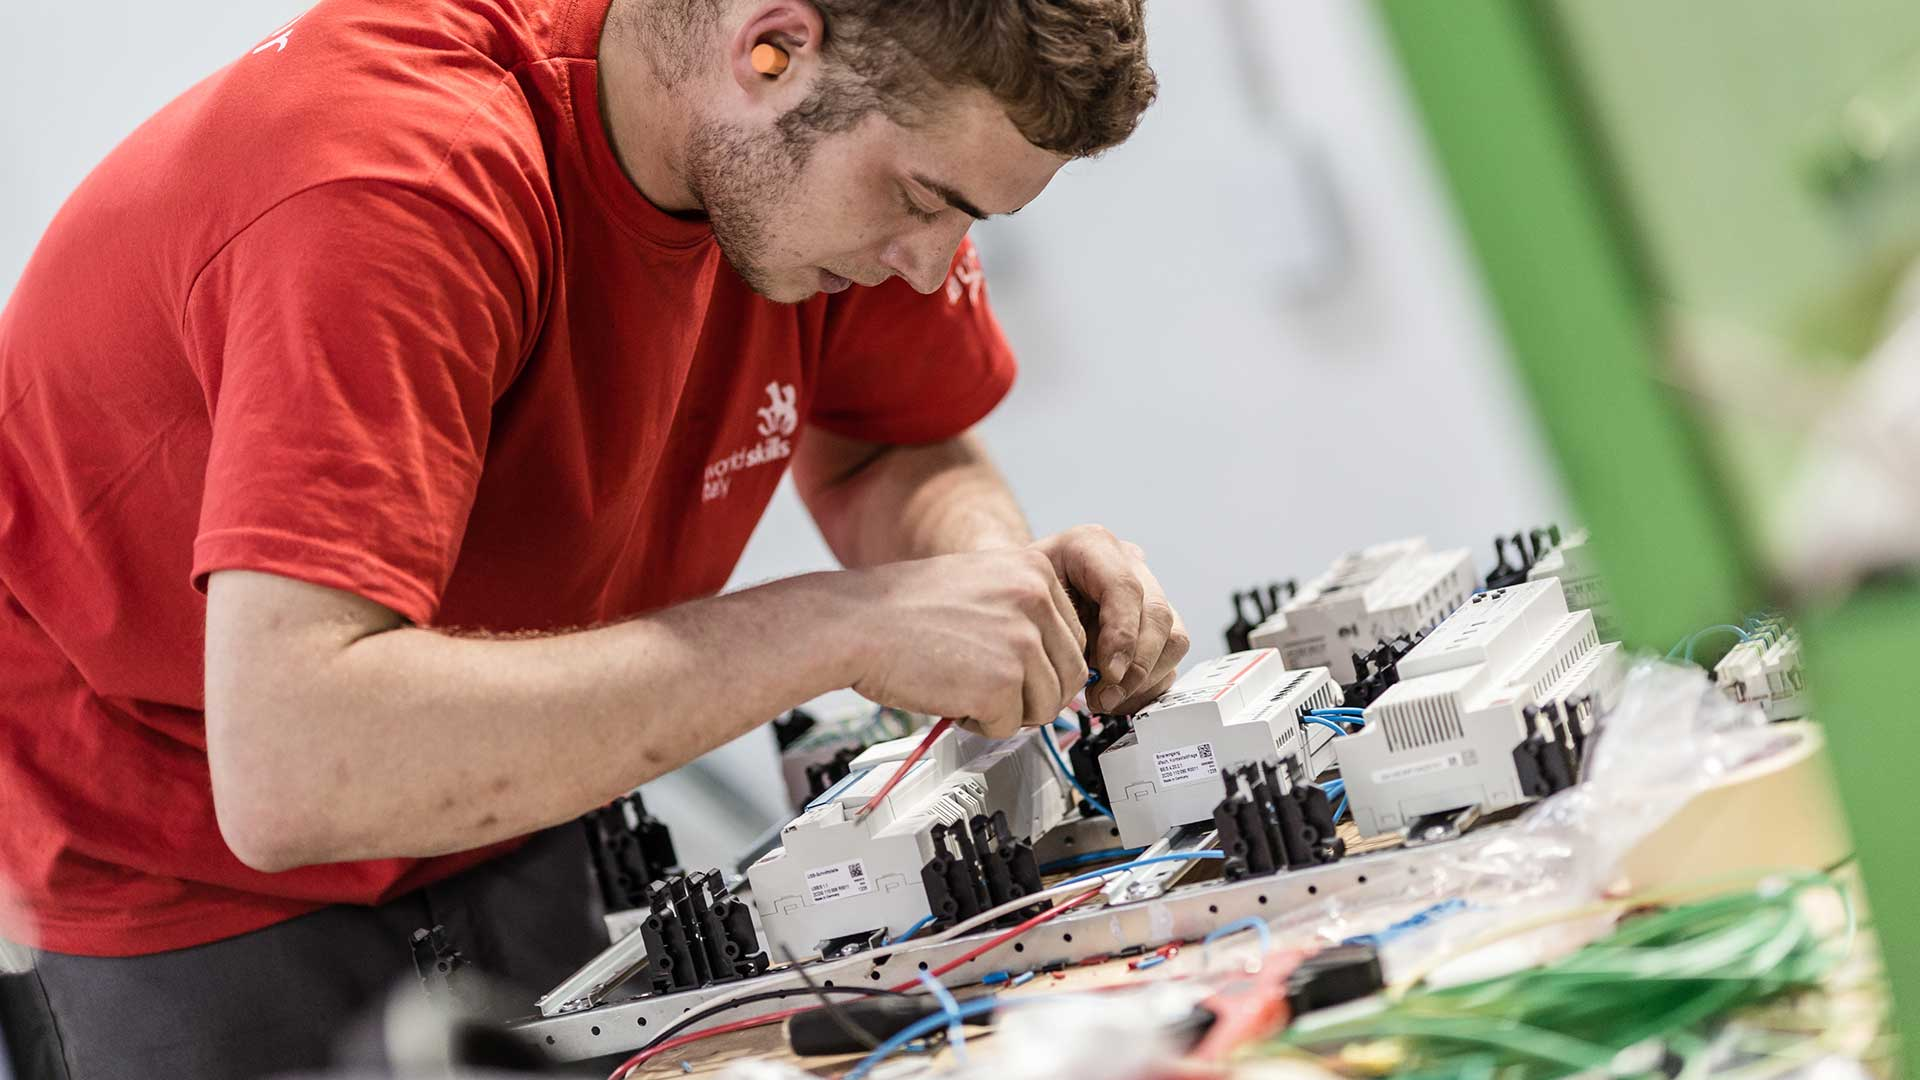 Elektromechaniker